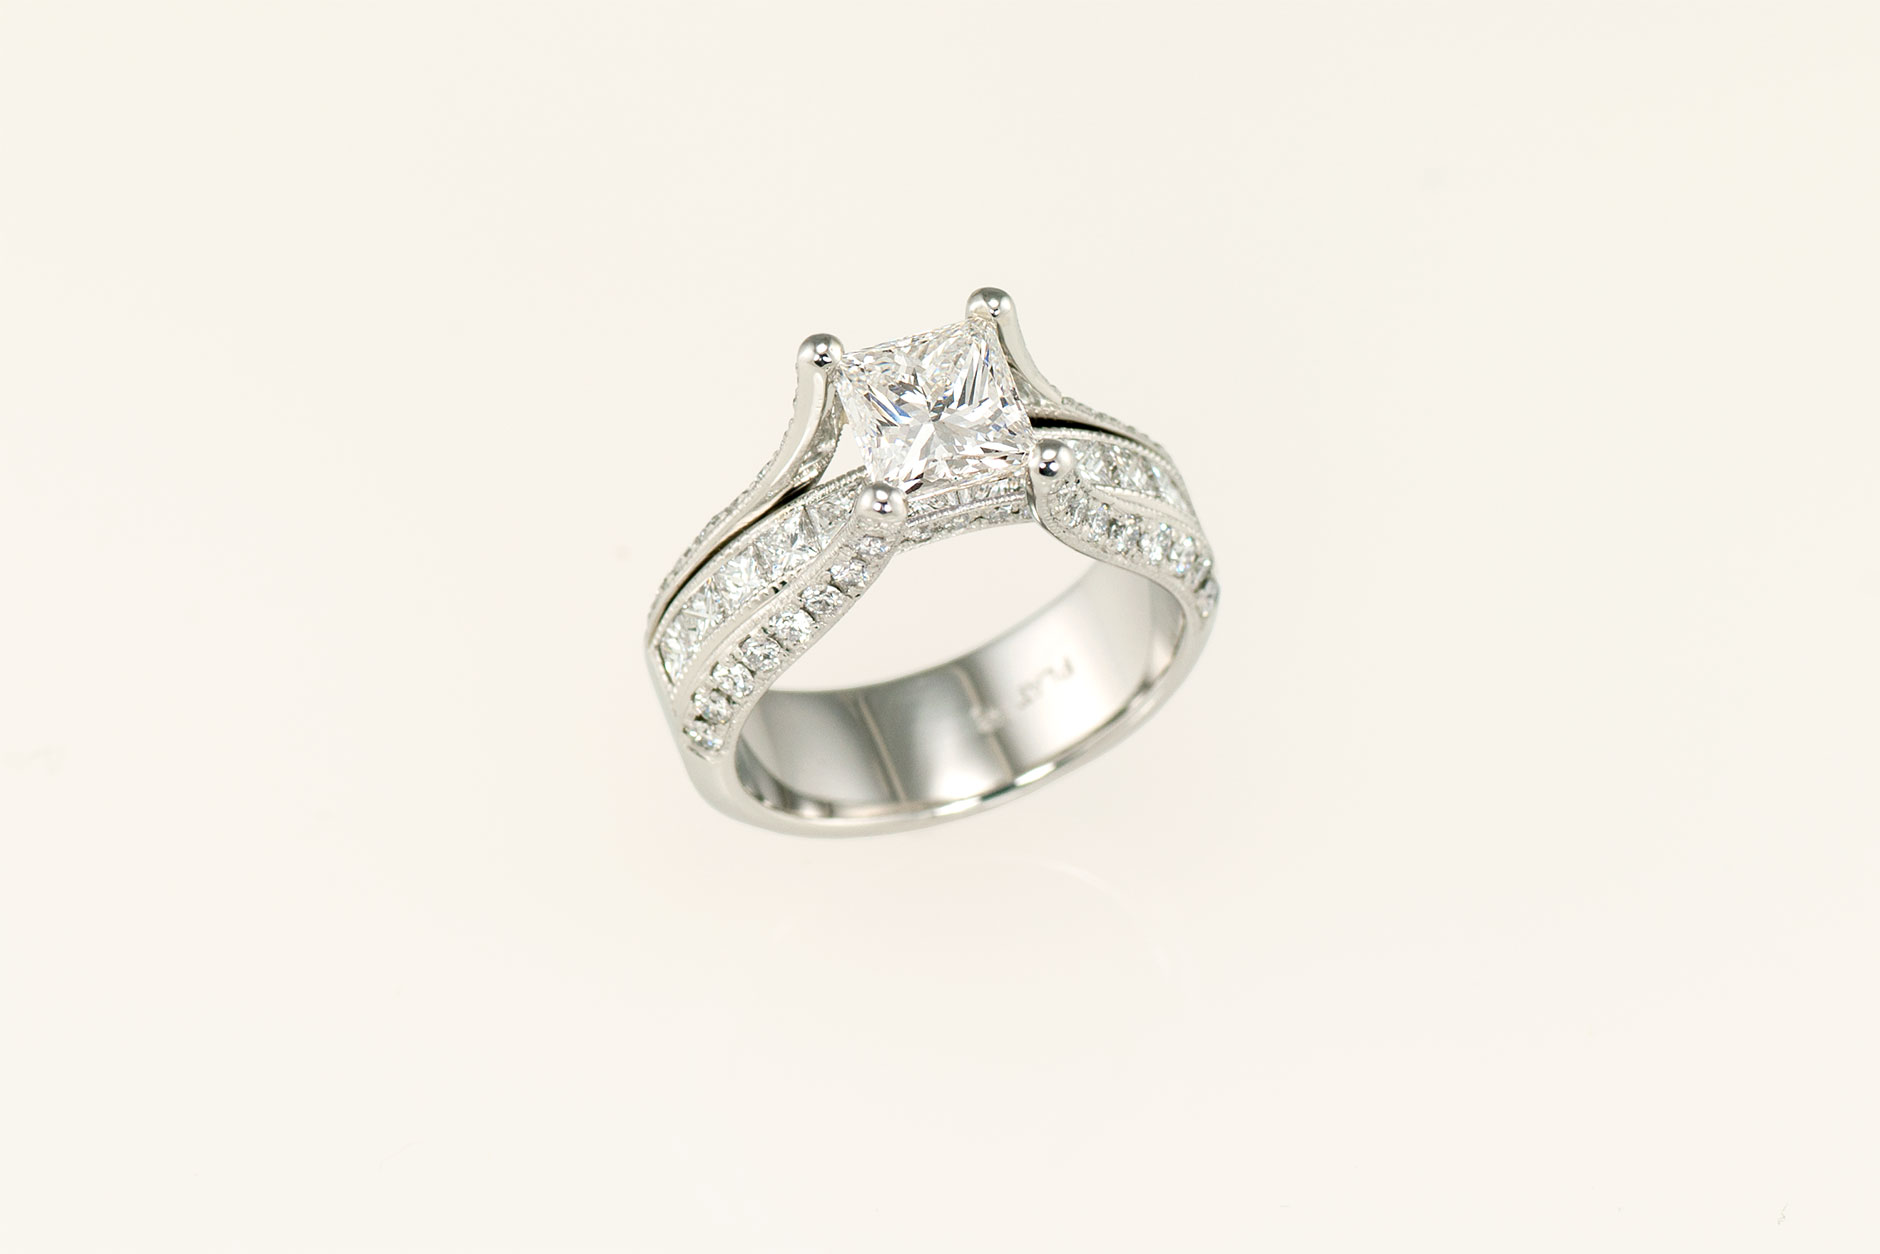 Custom Platinum Princess Cut Diamond Engagement Ring w Milgrain Edges - NEWA Goldsmith